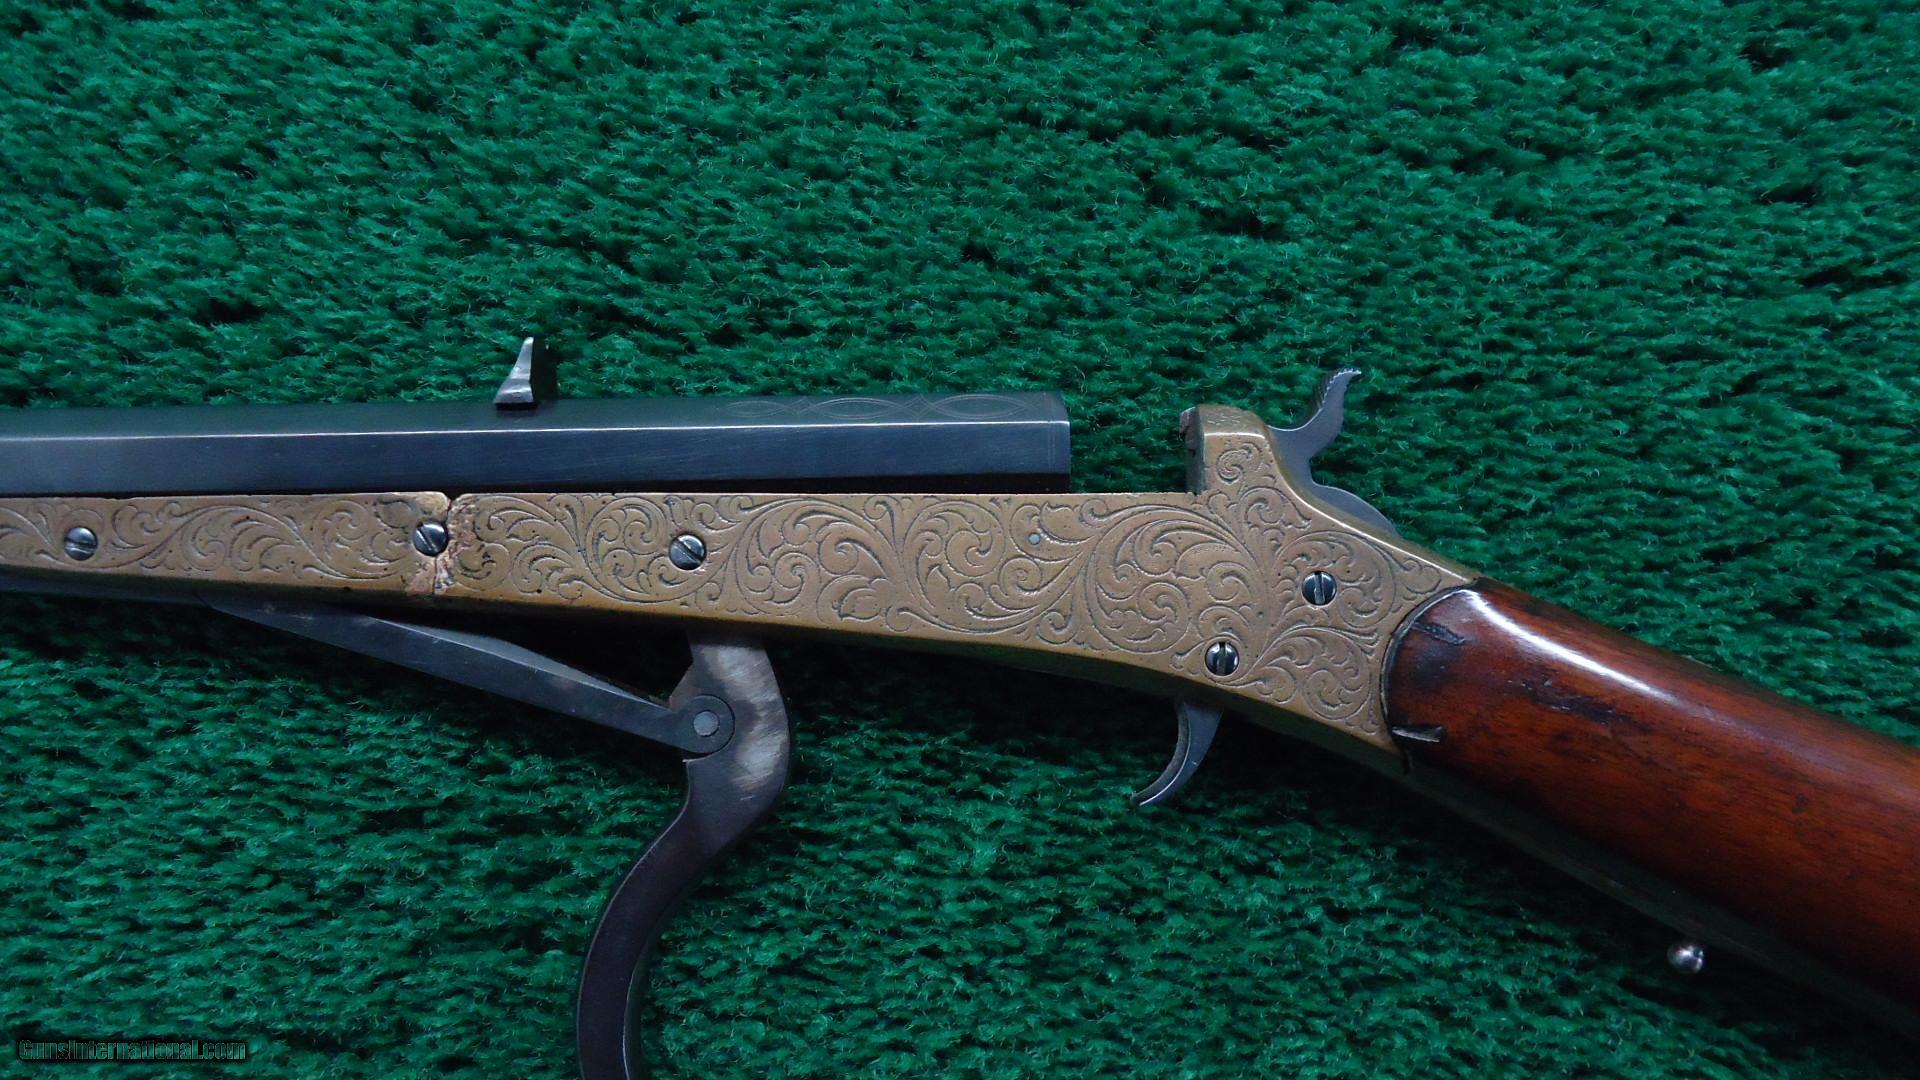 remington singles Remington handguns r1 tactical remington firearms 96486 1911 single 45 acp 5 15+1 black g10 grip black stainless steel remington's 1911 r1 tactical pistol features a match grade.